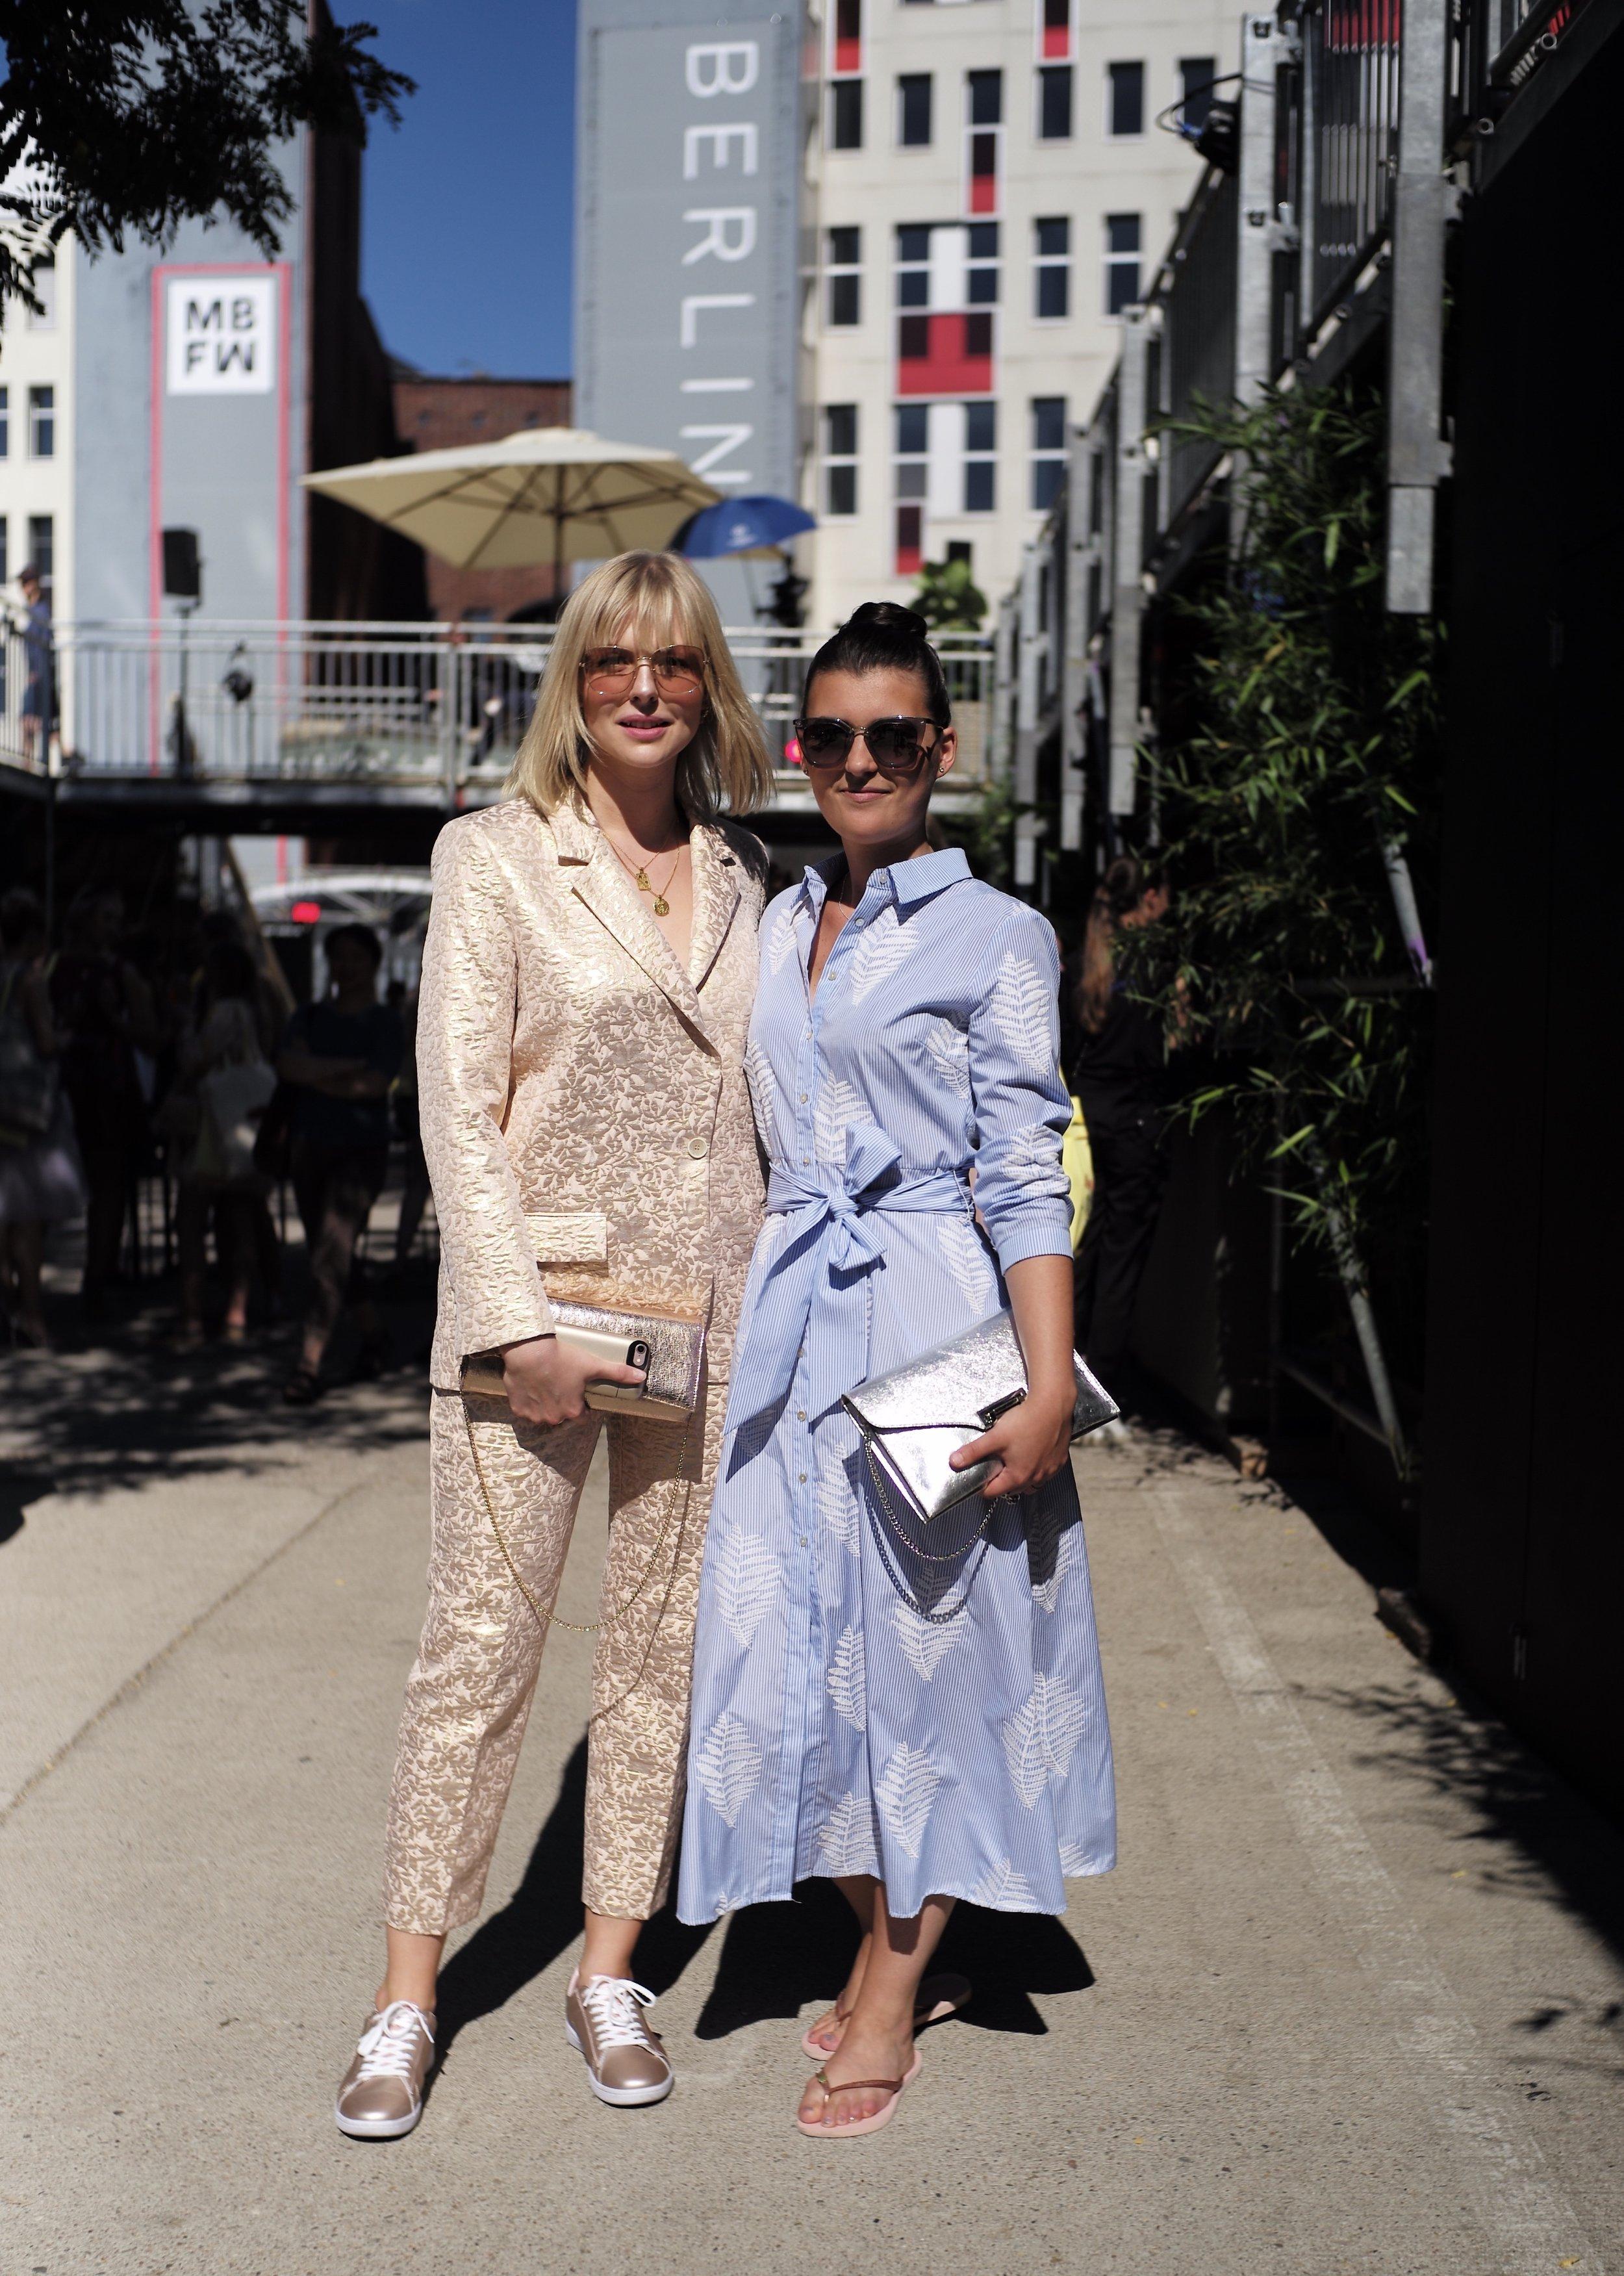 Carolin Lauffenburger - Fashion Show Lena Hoschek Juli 2018Photo by Thomas Tiefseetaucher